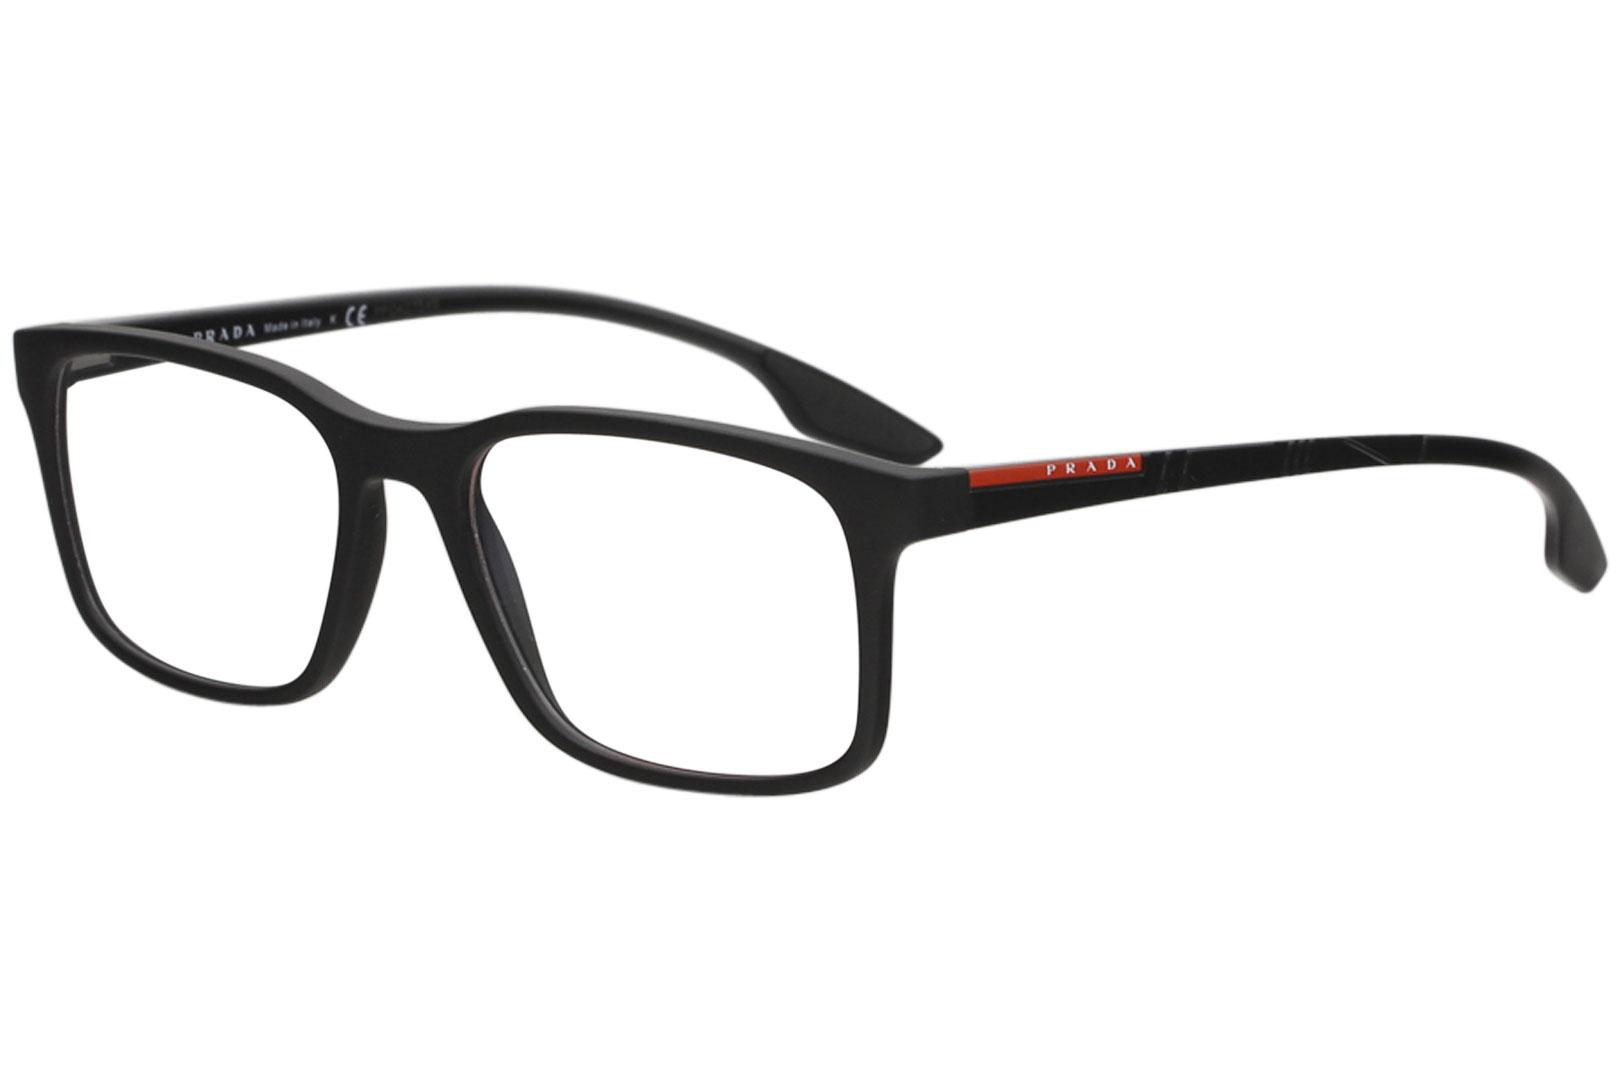 a43dff240b Prada Linea Rossa Eyeglasses VPS01L VPS 01L 1BO 1O1 Mt Black Optical ...